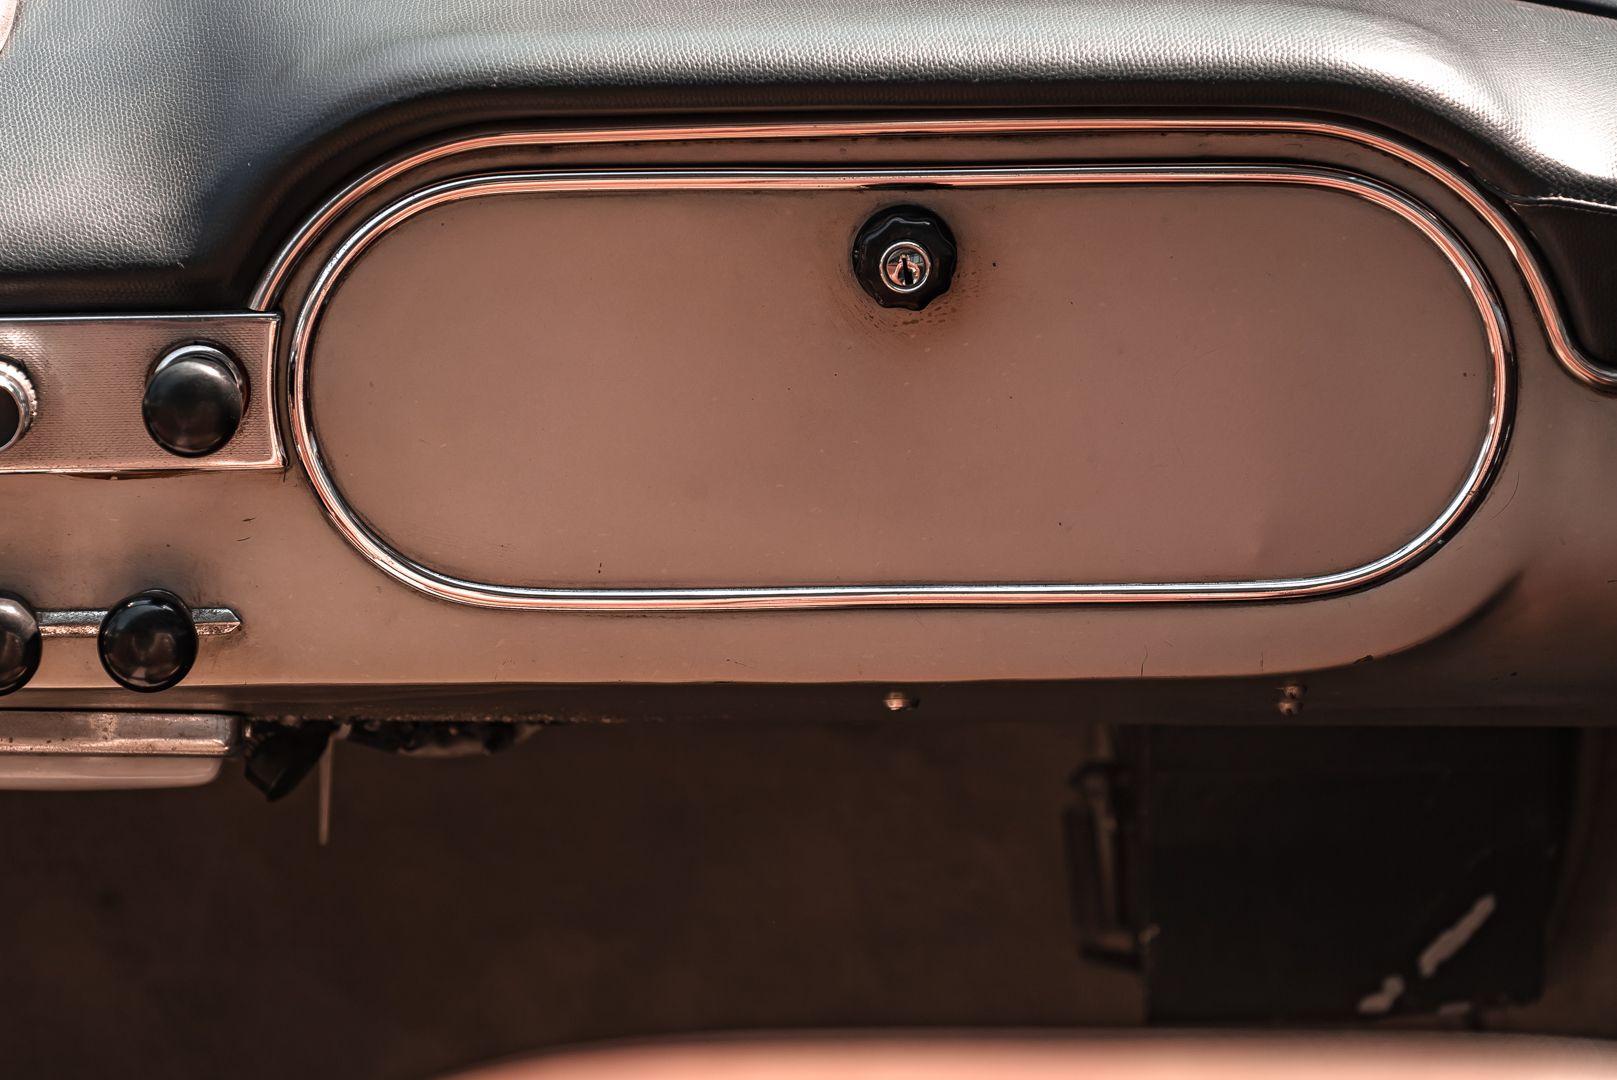 1963 Lancia Flaminia Touring Convertible 2500 3C  73167